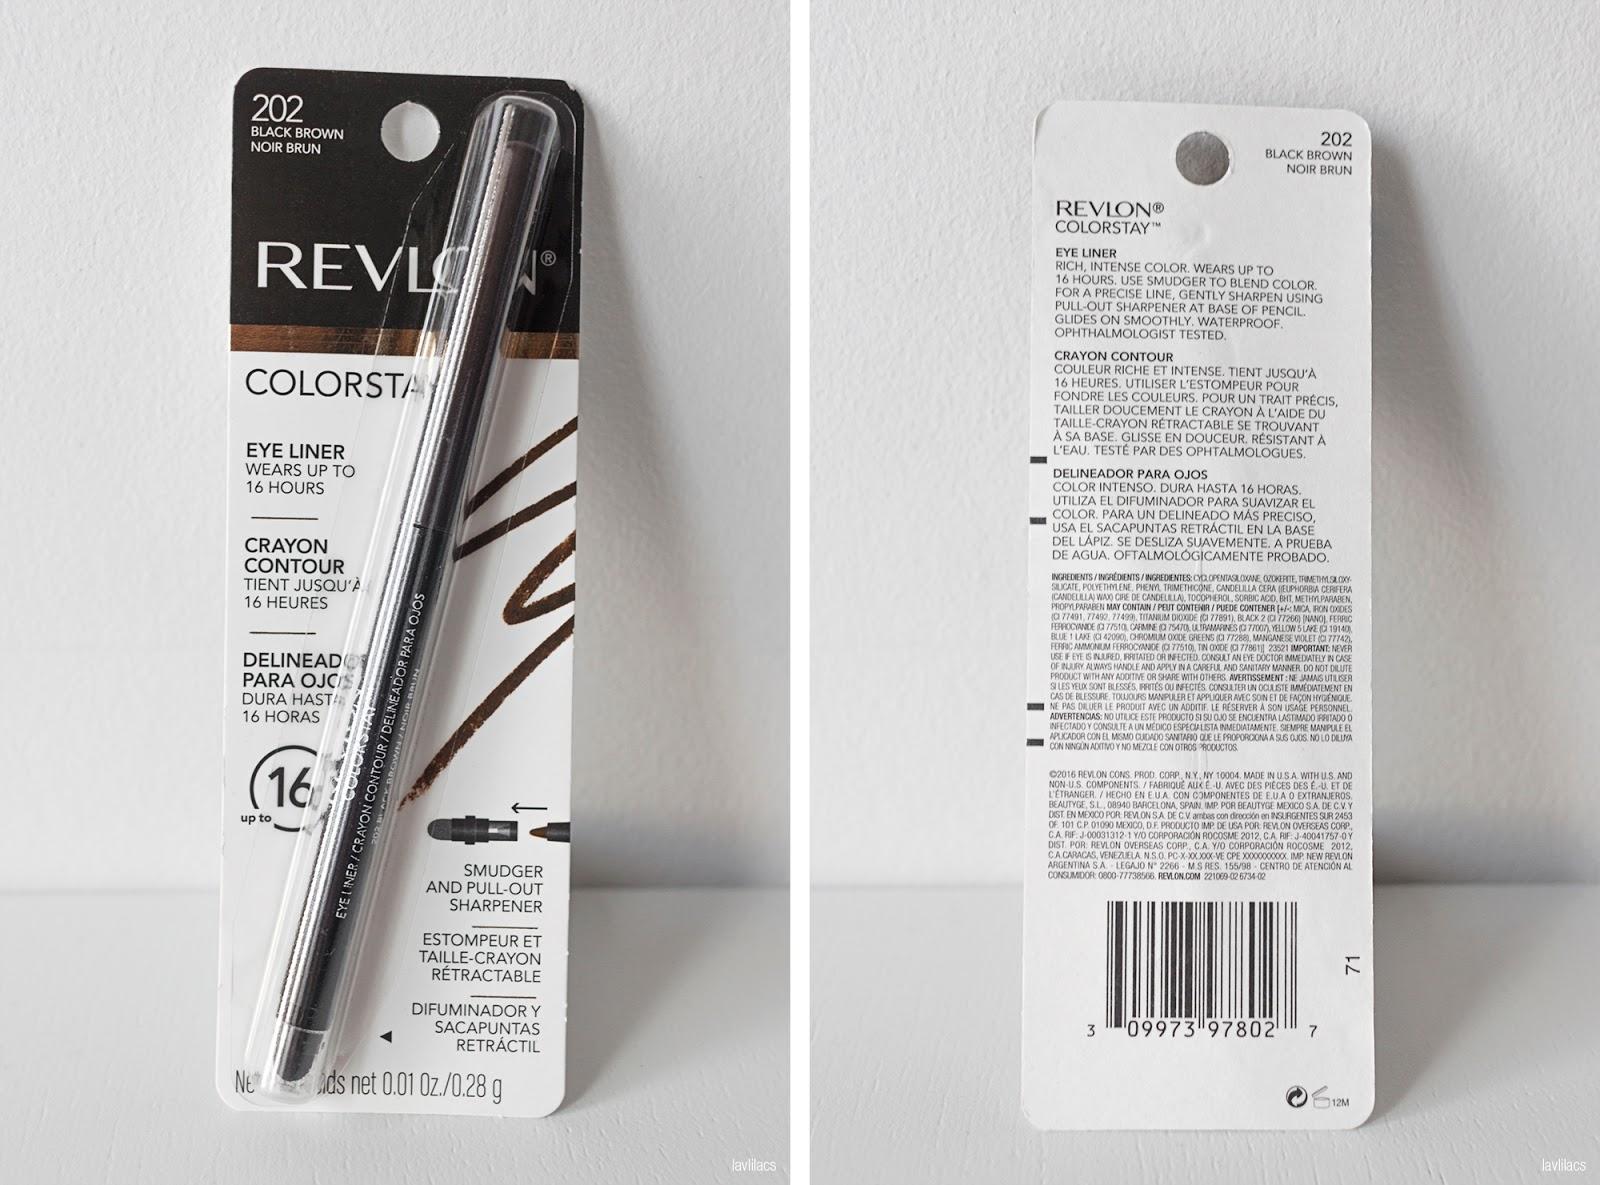 lavlilacs Revlon Colorstay Eye Liner 202 Black Brown packaging